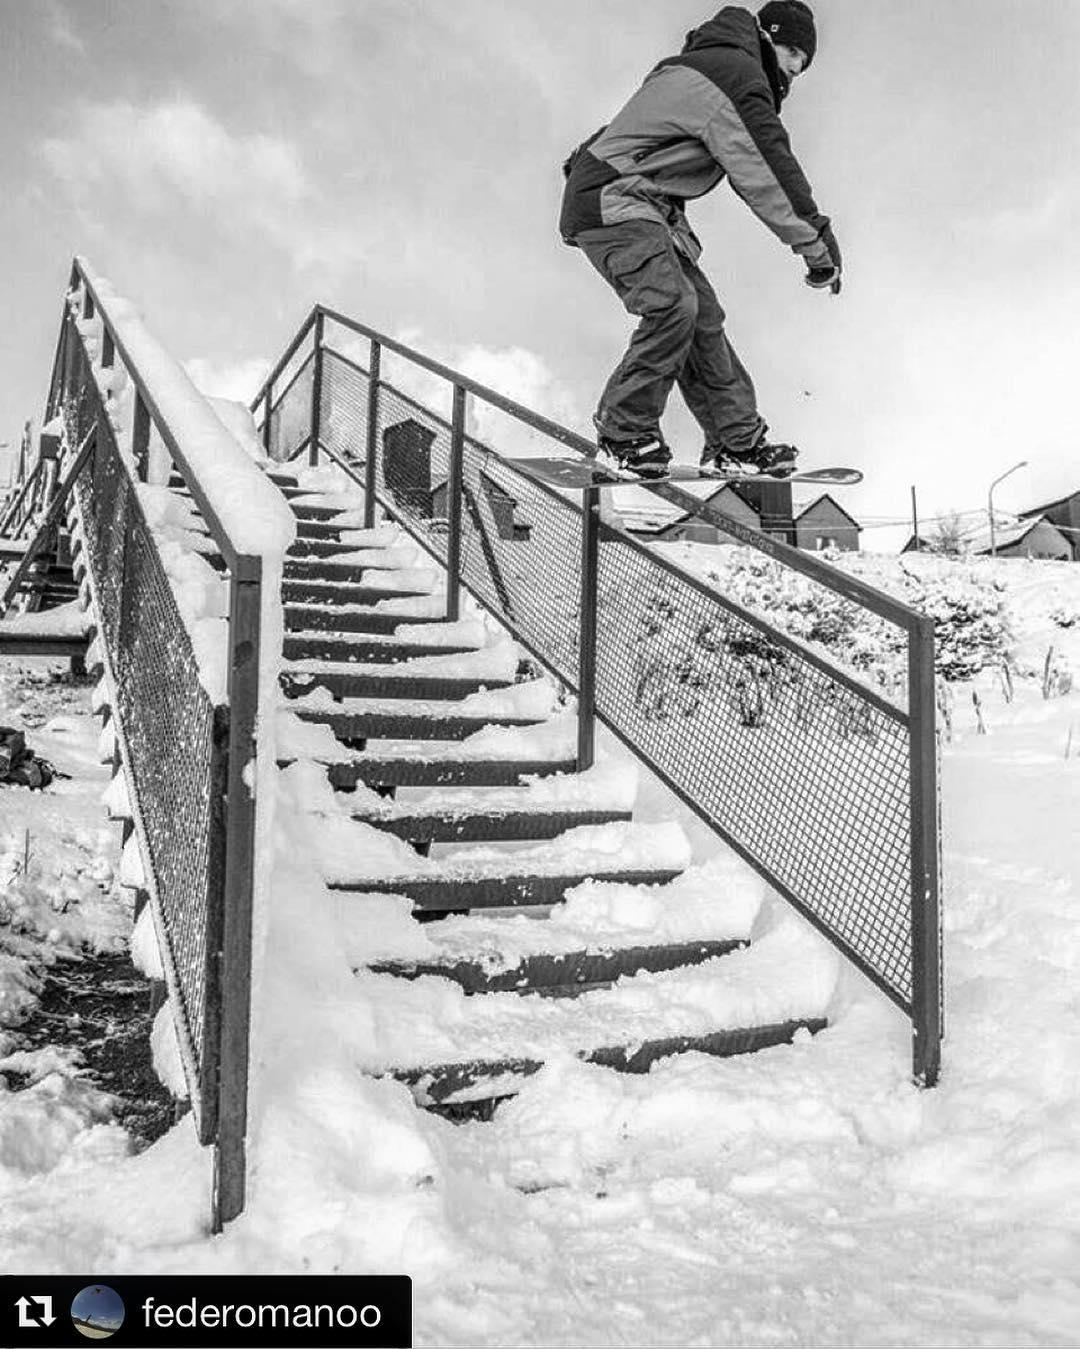 #Repost @federomanoo #snowboarding #thriveargentina #thrivesnowboards #relentless #thriveharder